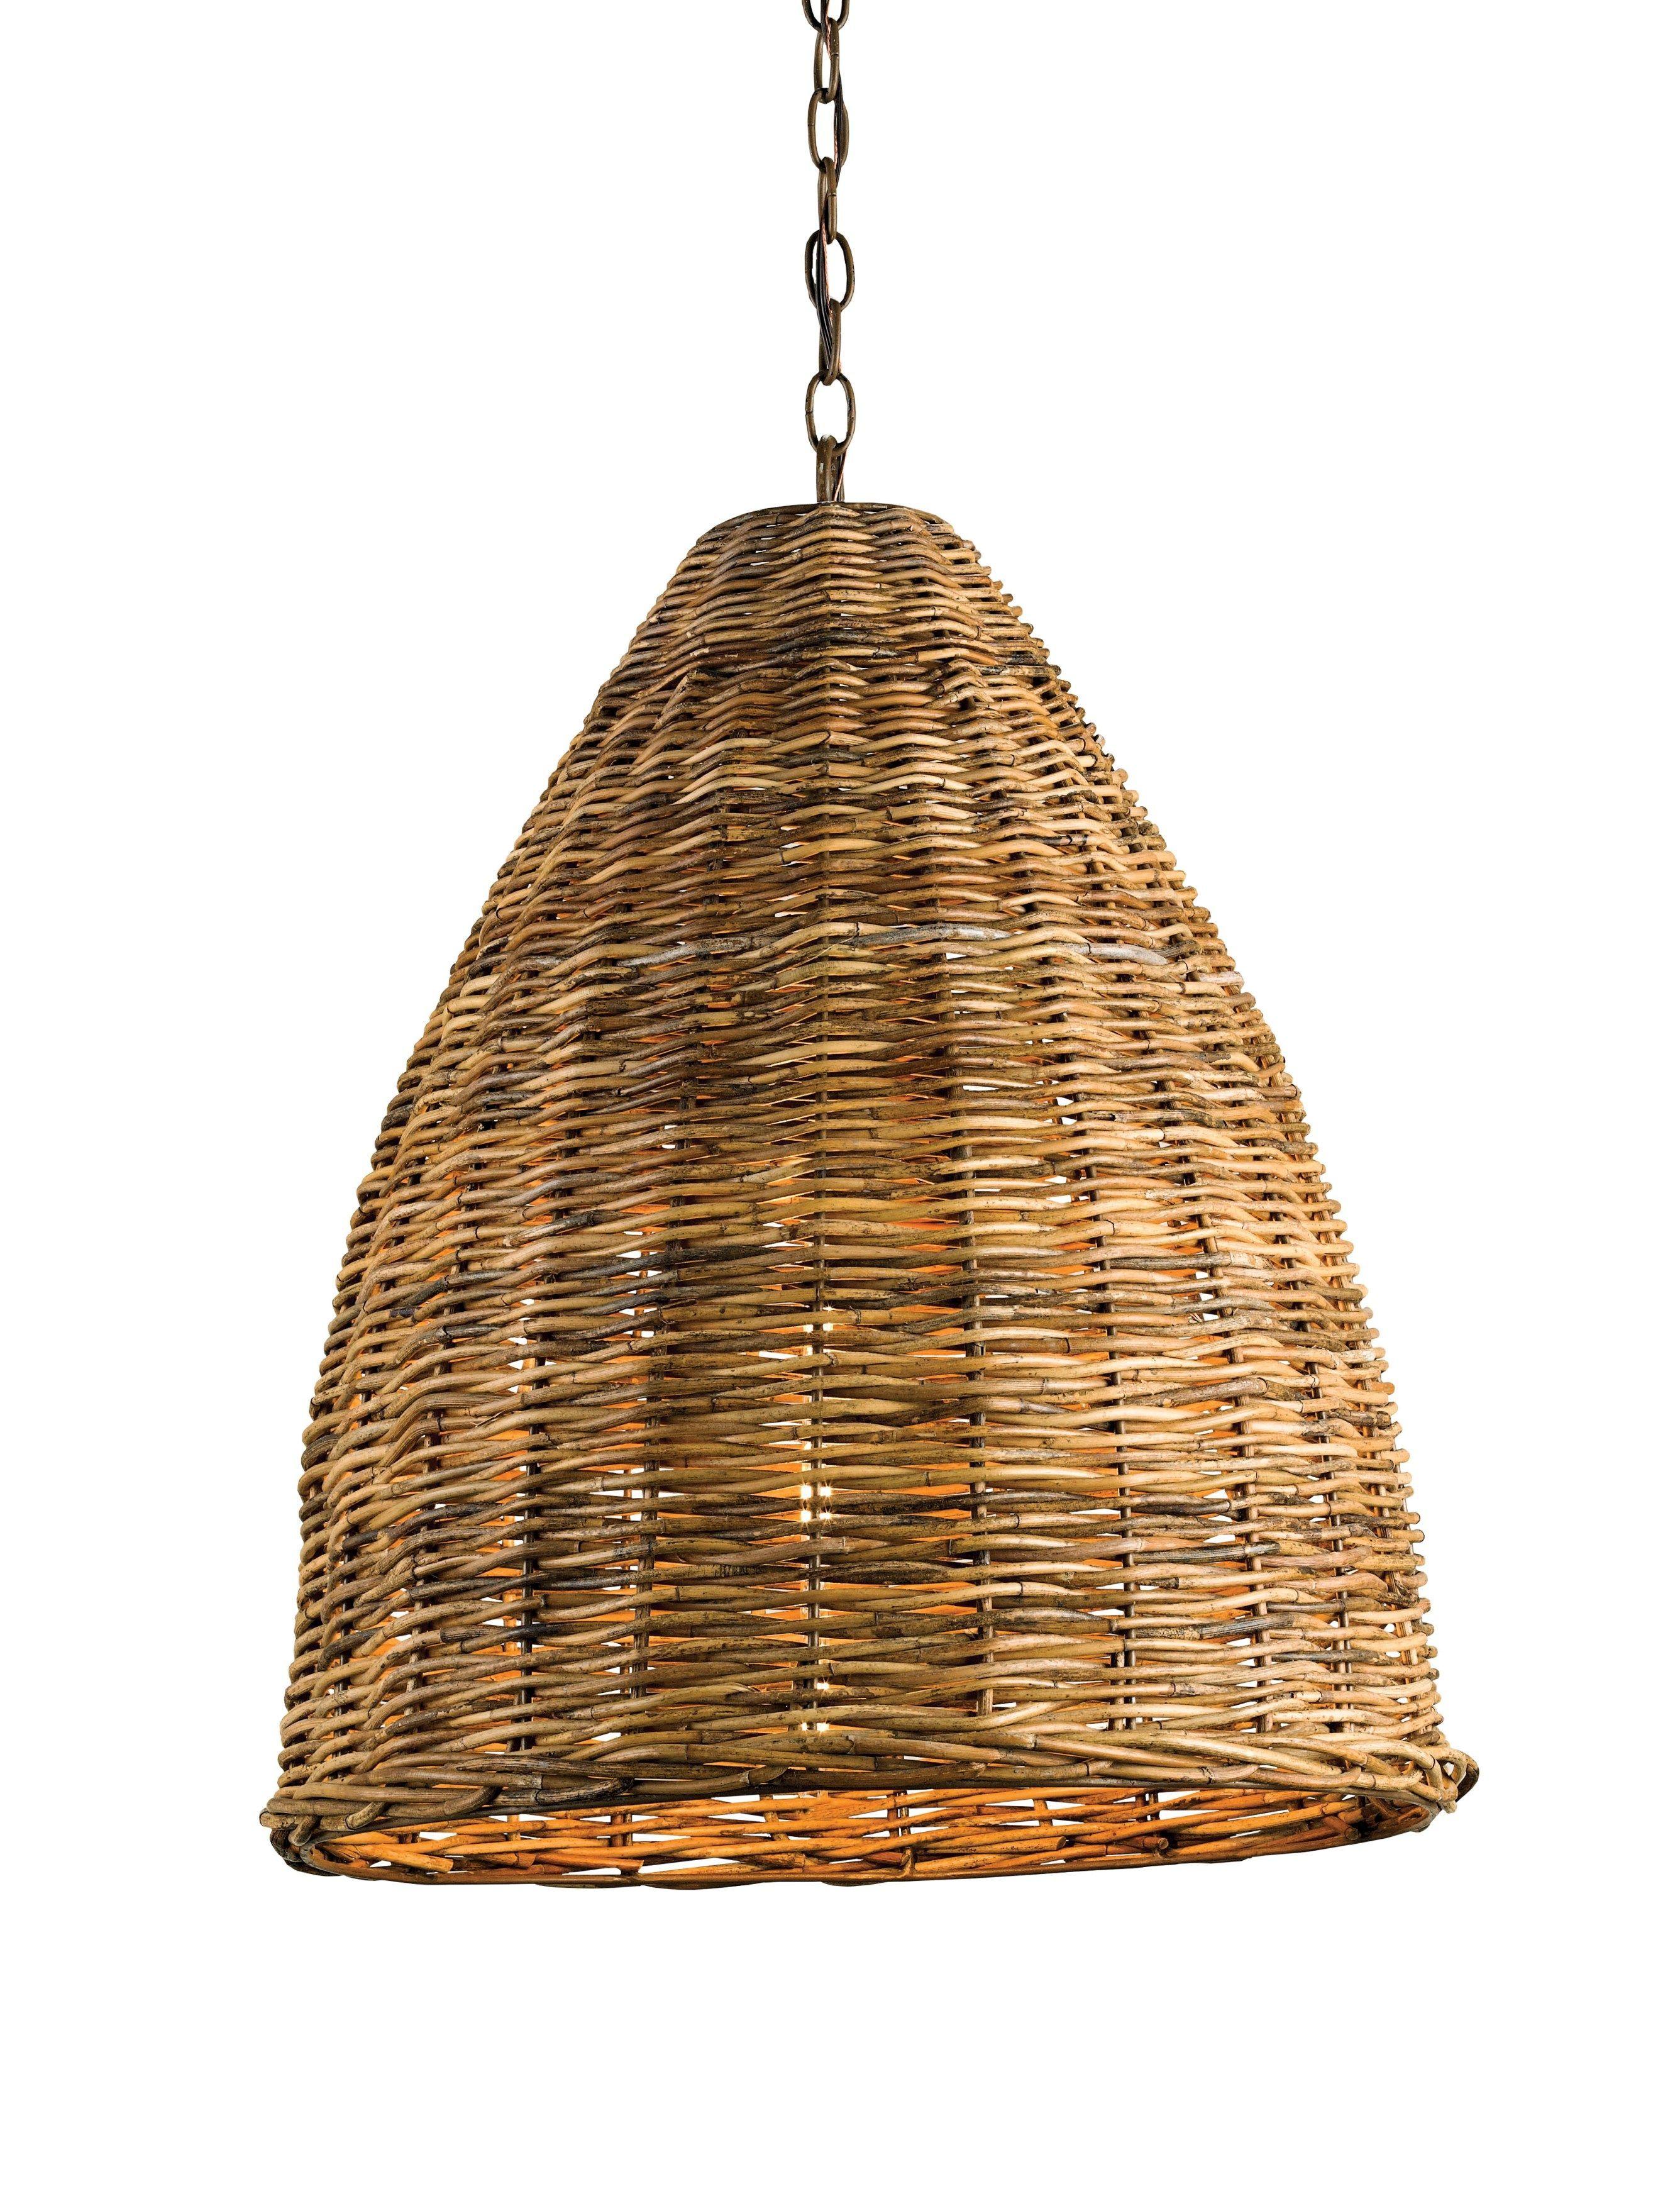 Basket pendant coastal chandeliers u hanging lights pinterest